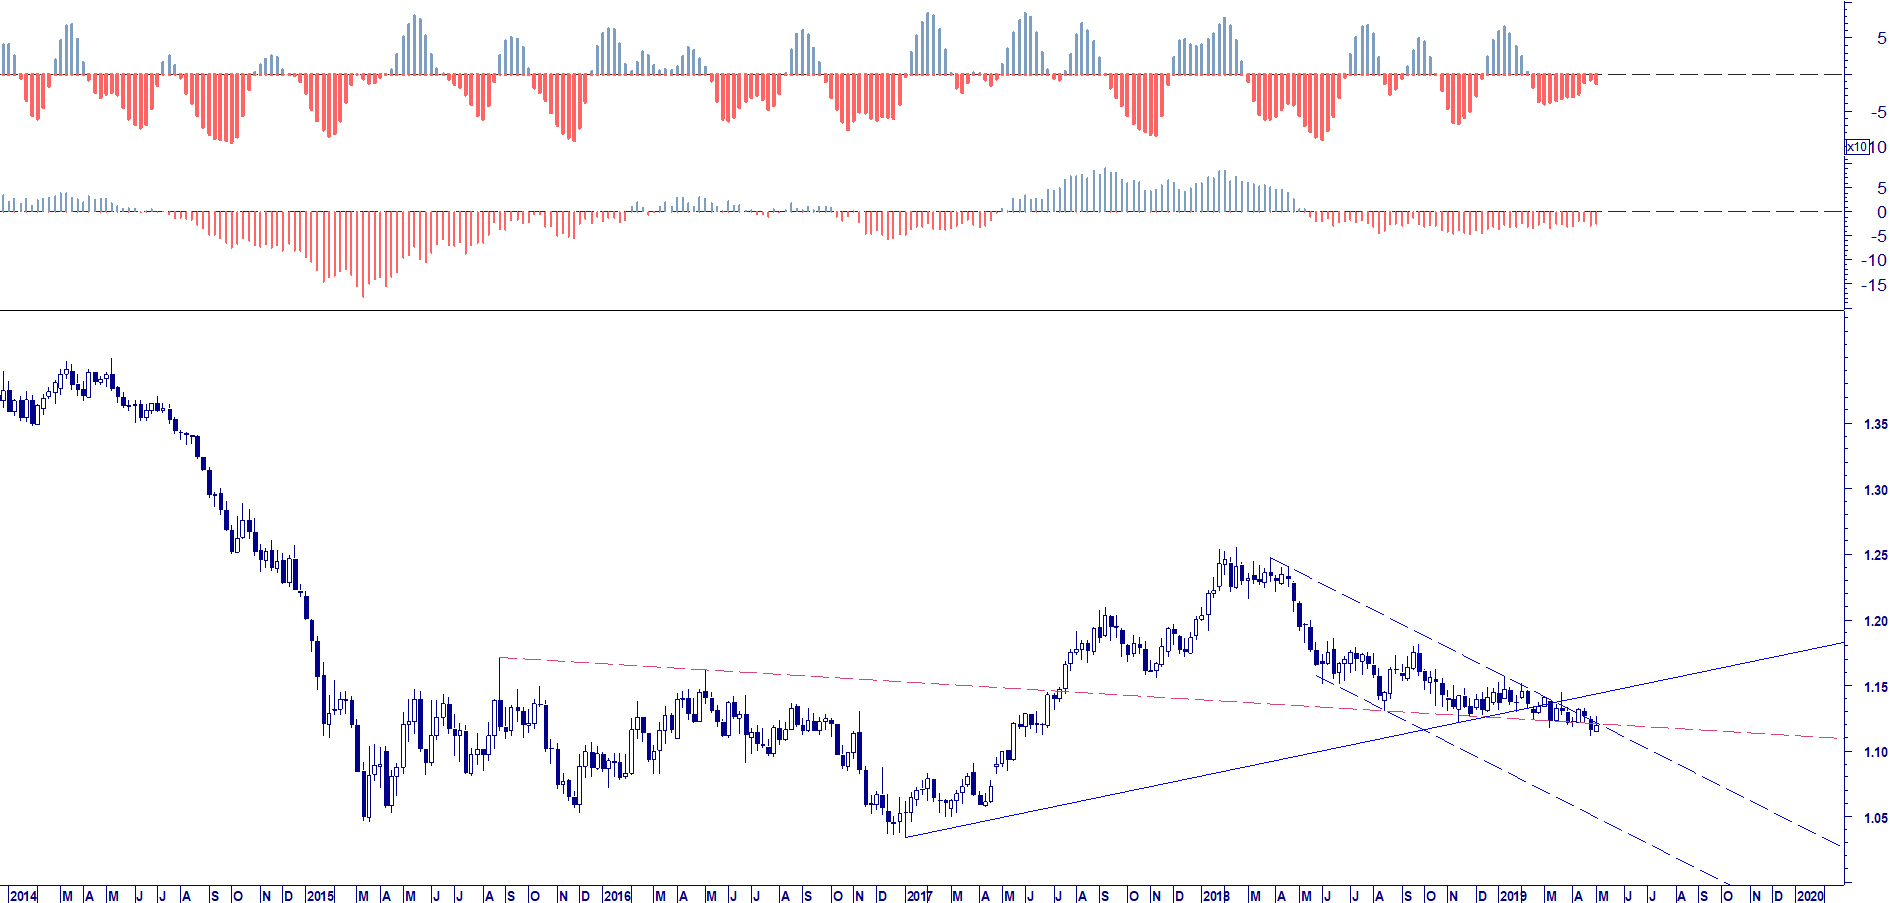 WB ENTERPRISE RISK MANAGEMENT: EUR USD RISCHIO CAMBIO